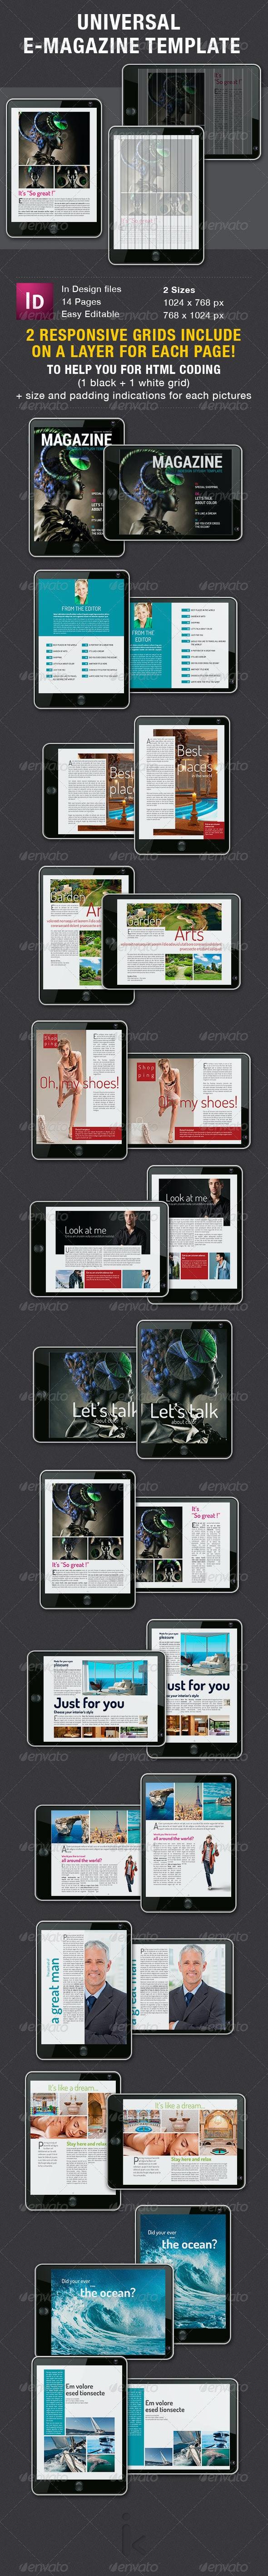 Universal E-Magazine Template - Digital Magazines ePublishing